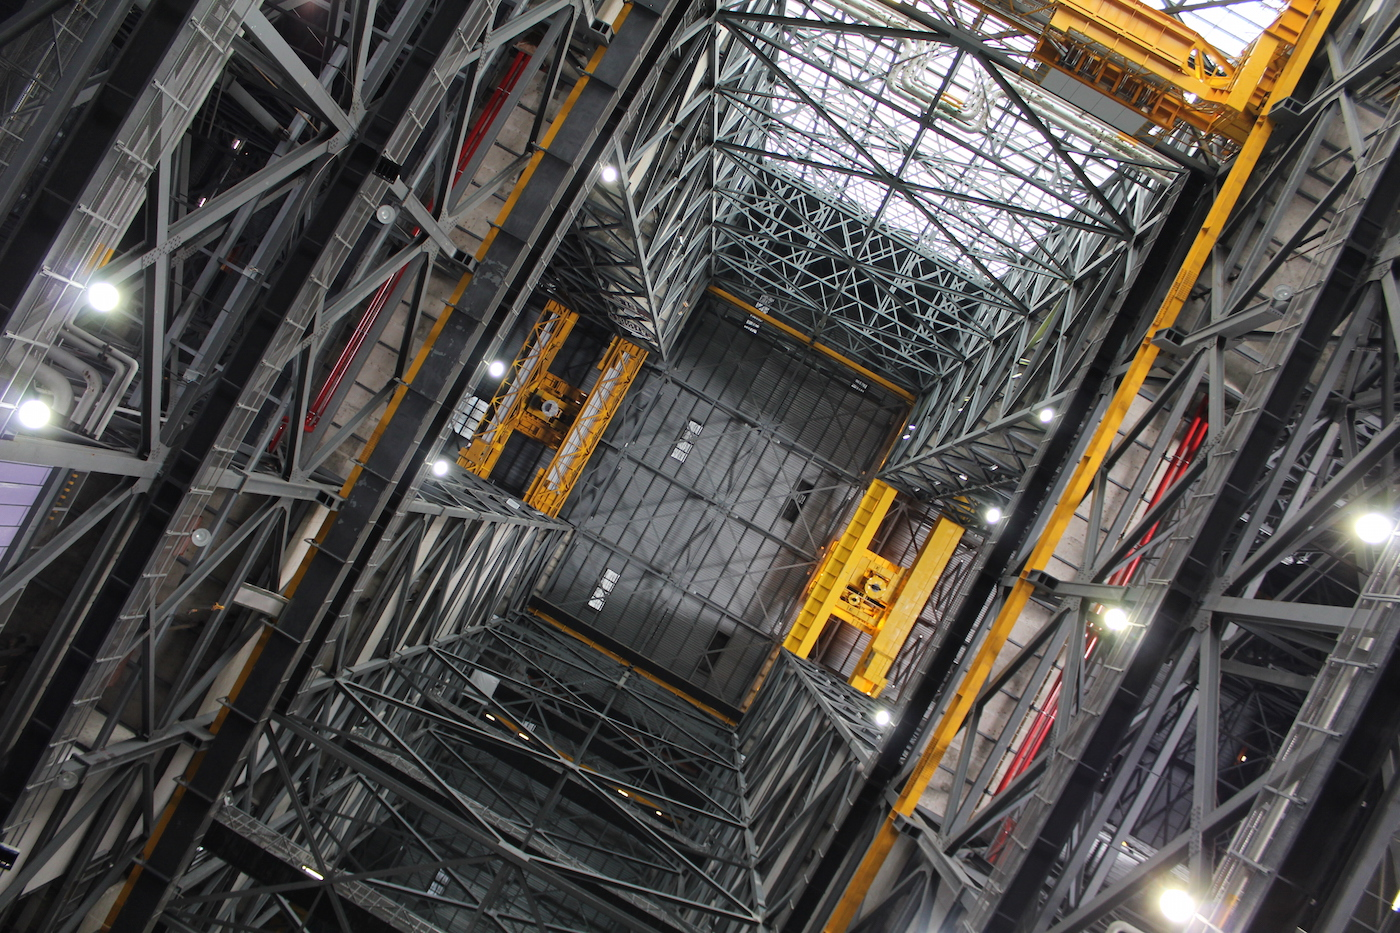 NASA's Vehicle Assembly Building